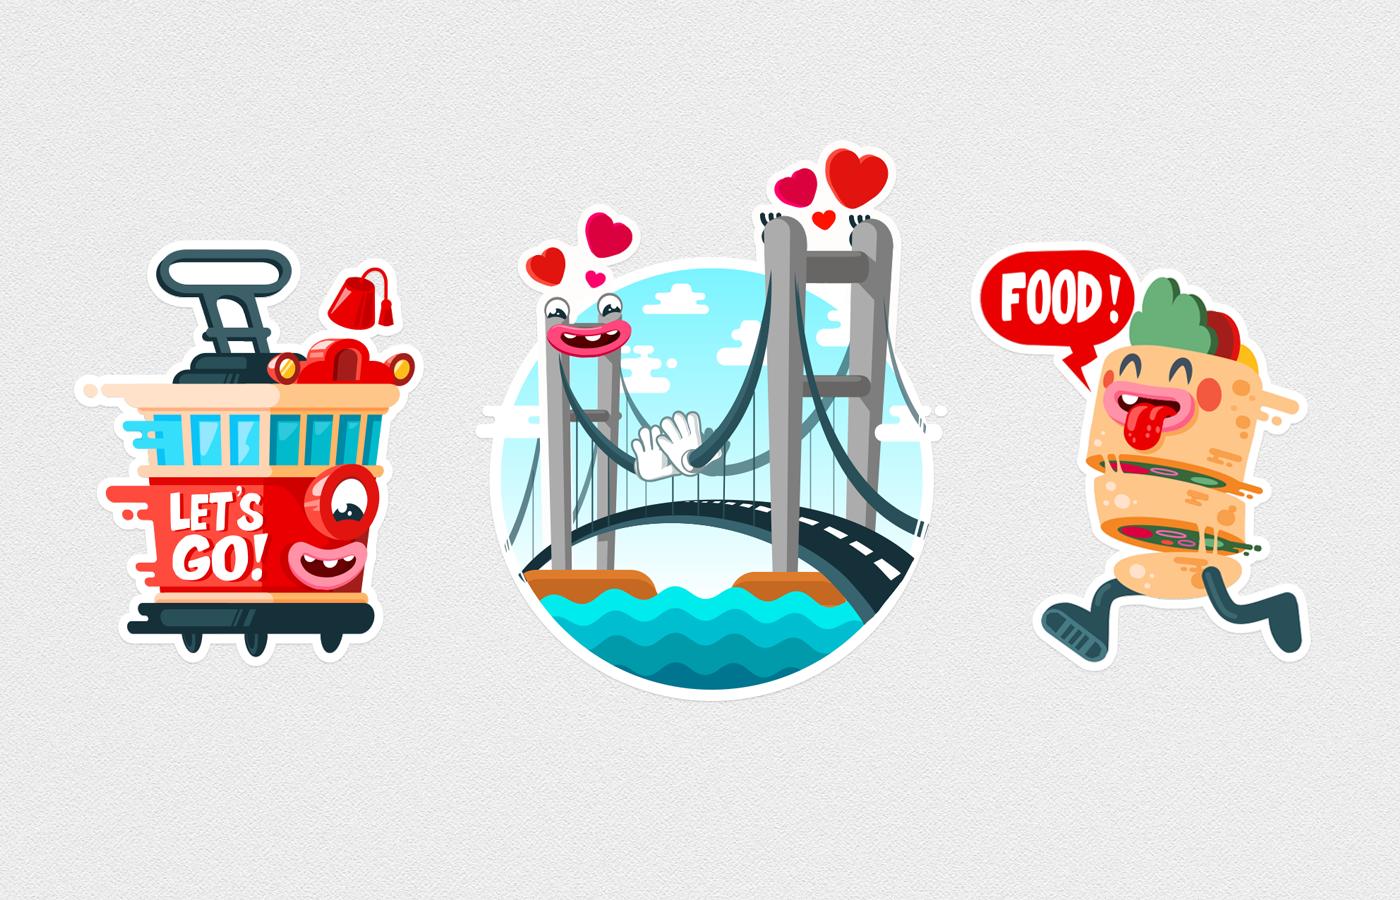 Istanbul viber stickers